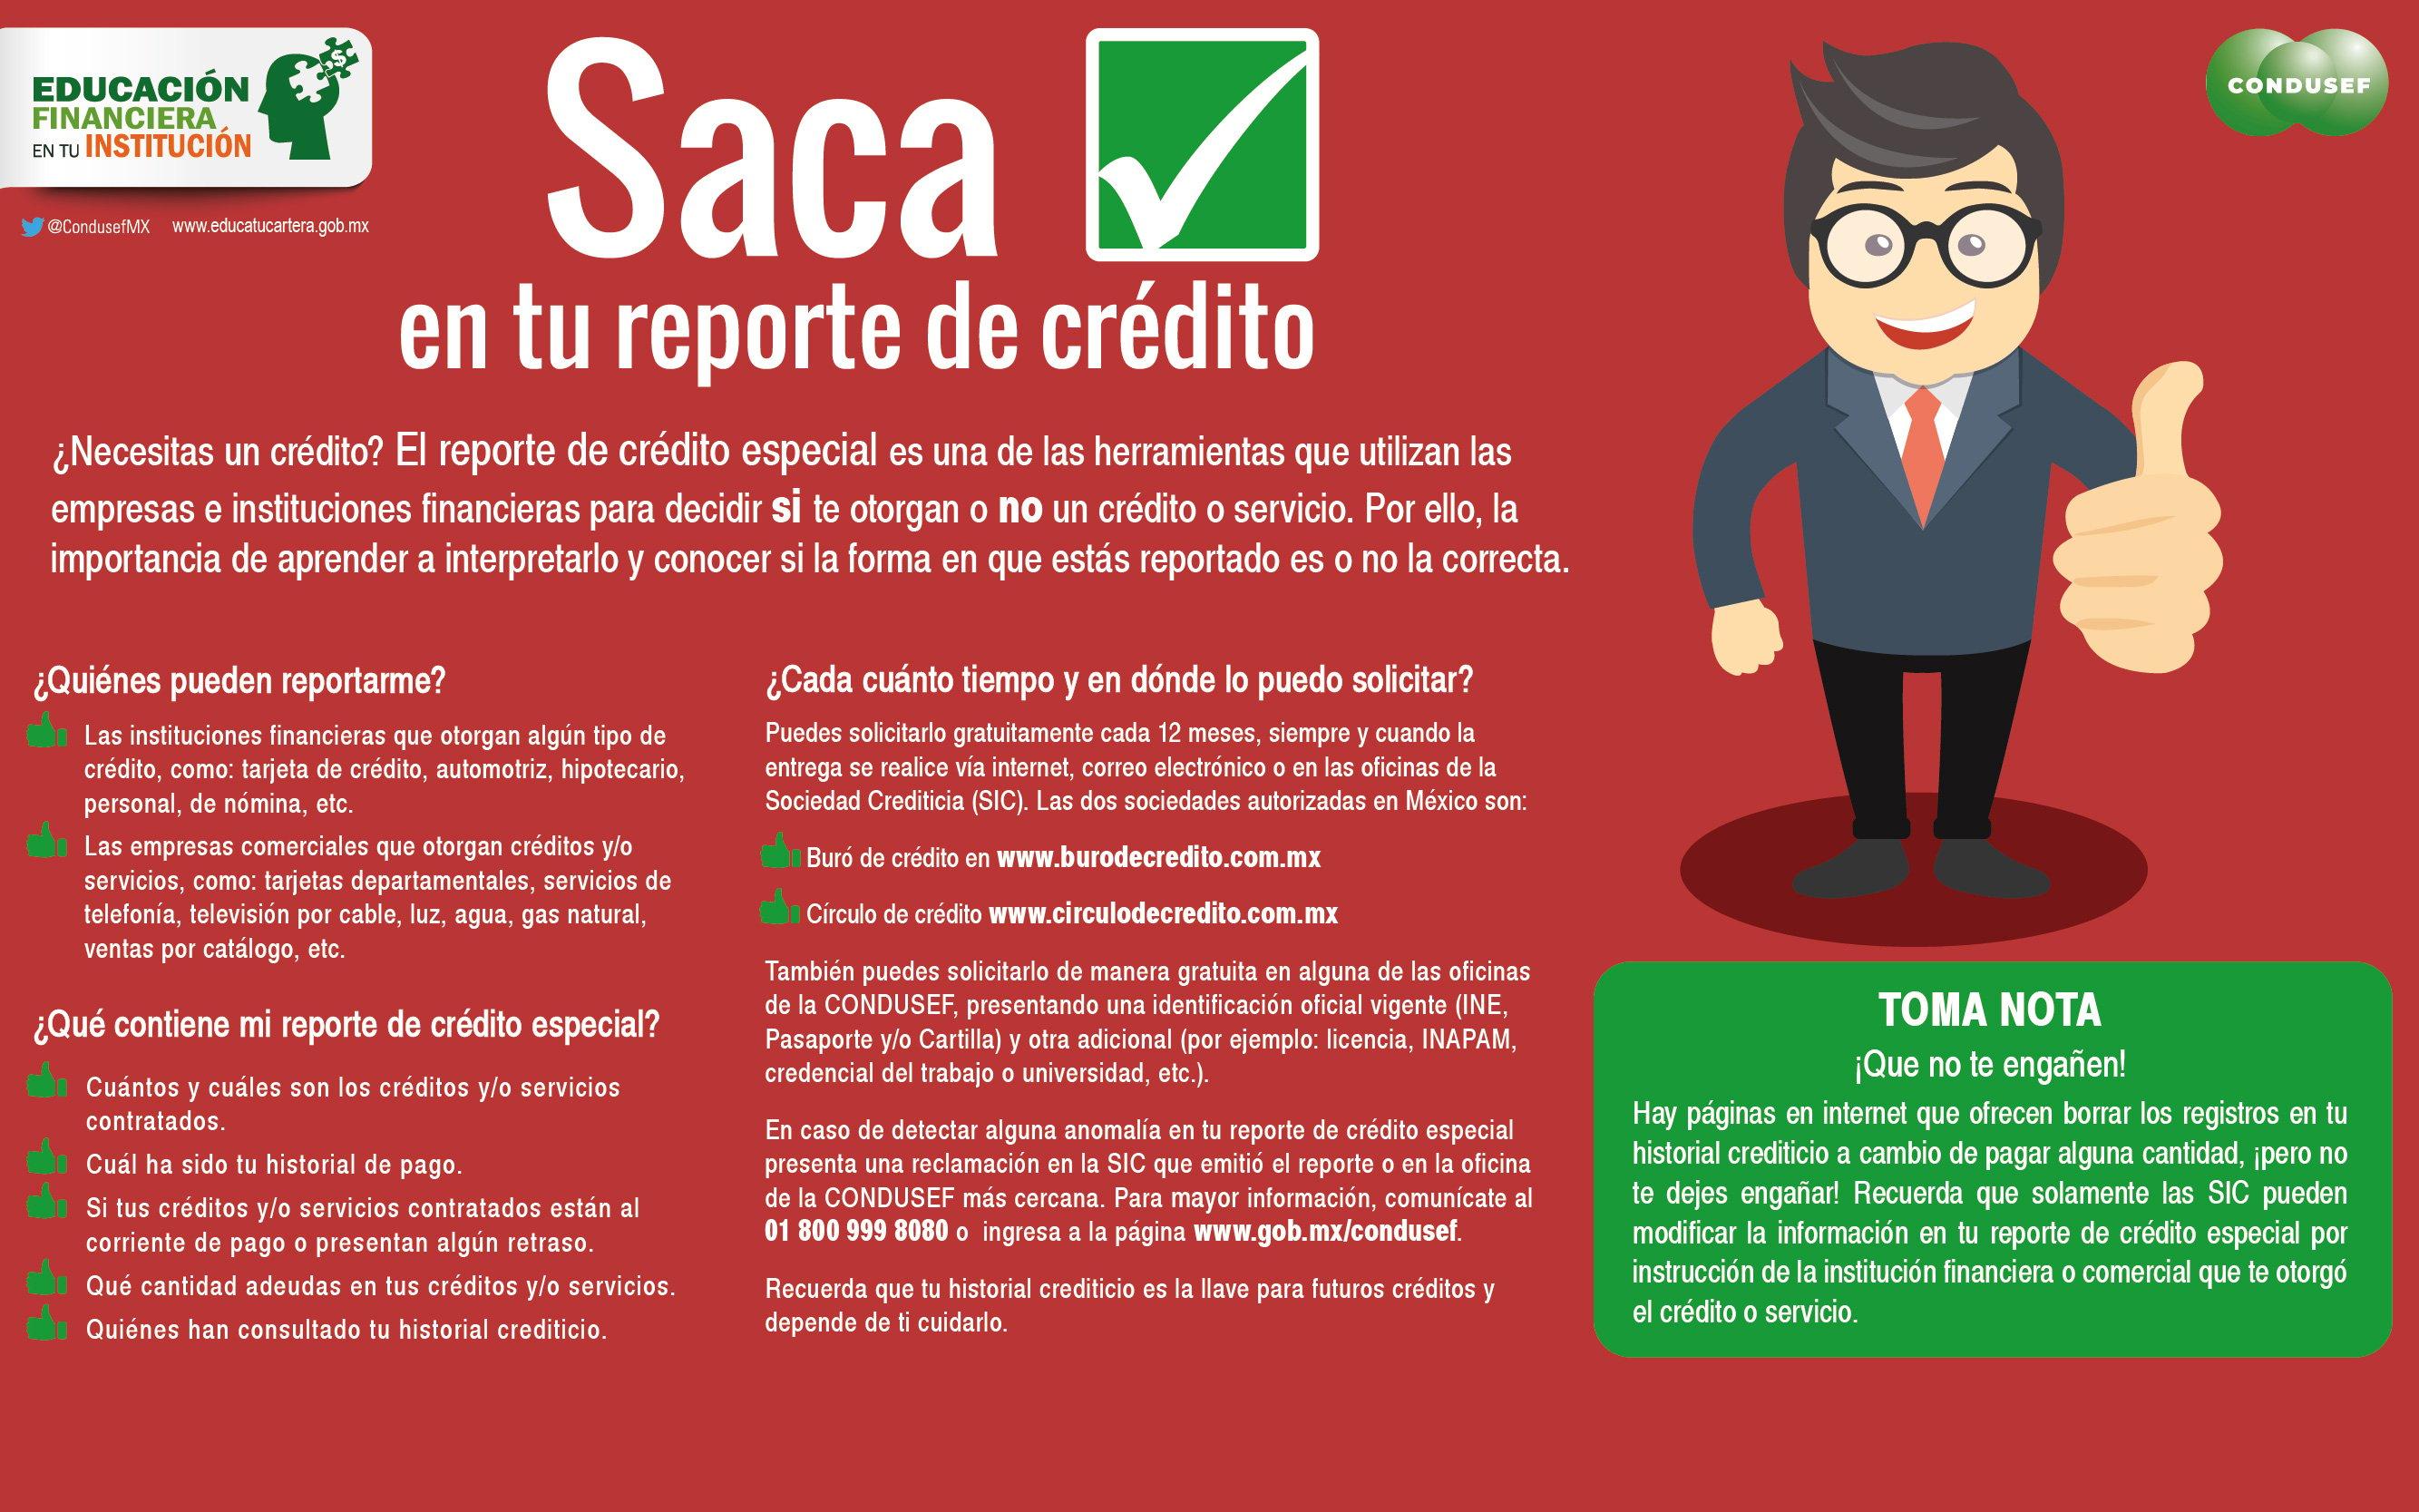 Saca ok en tu reporte de crédito